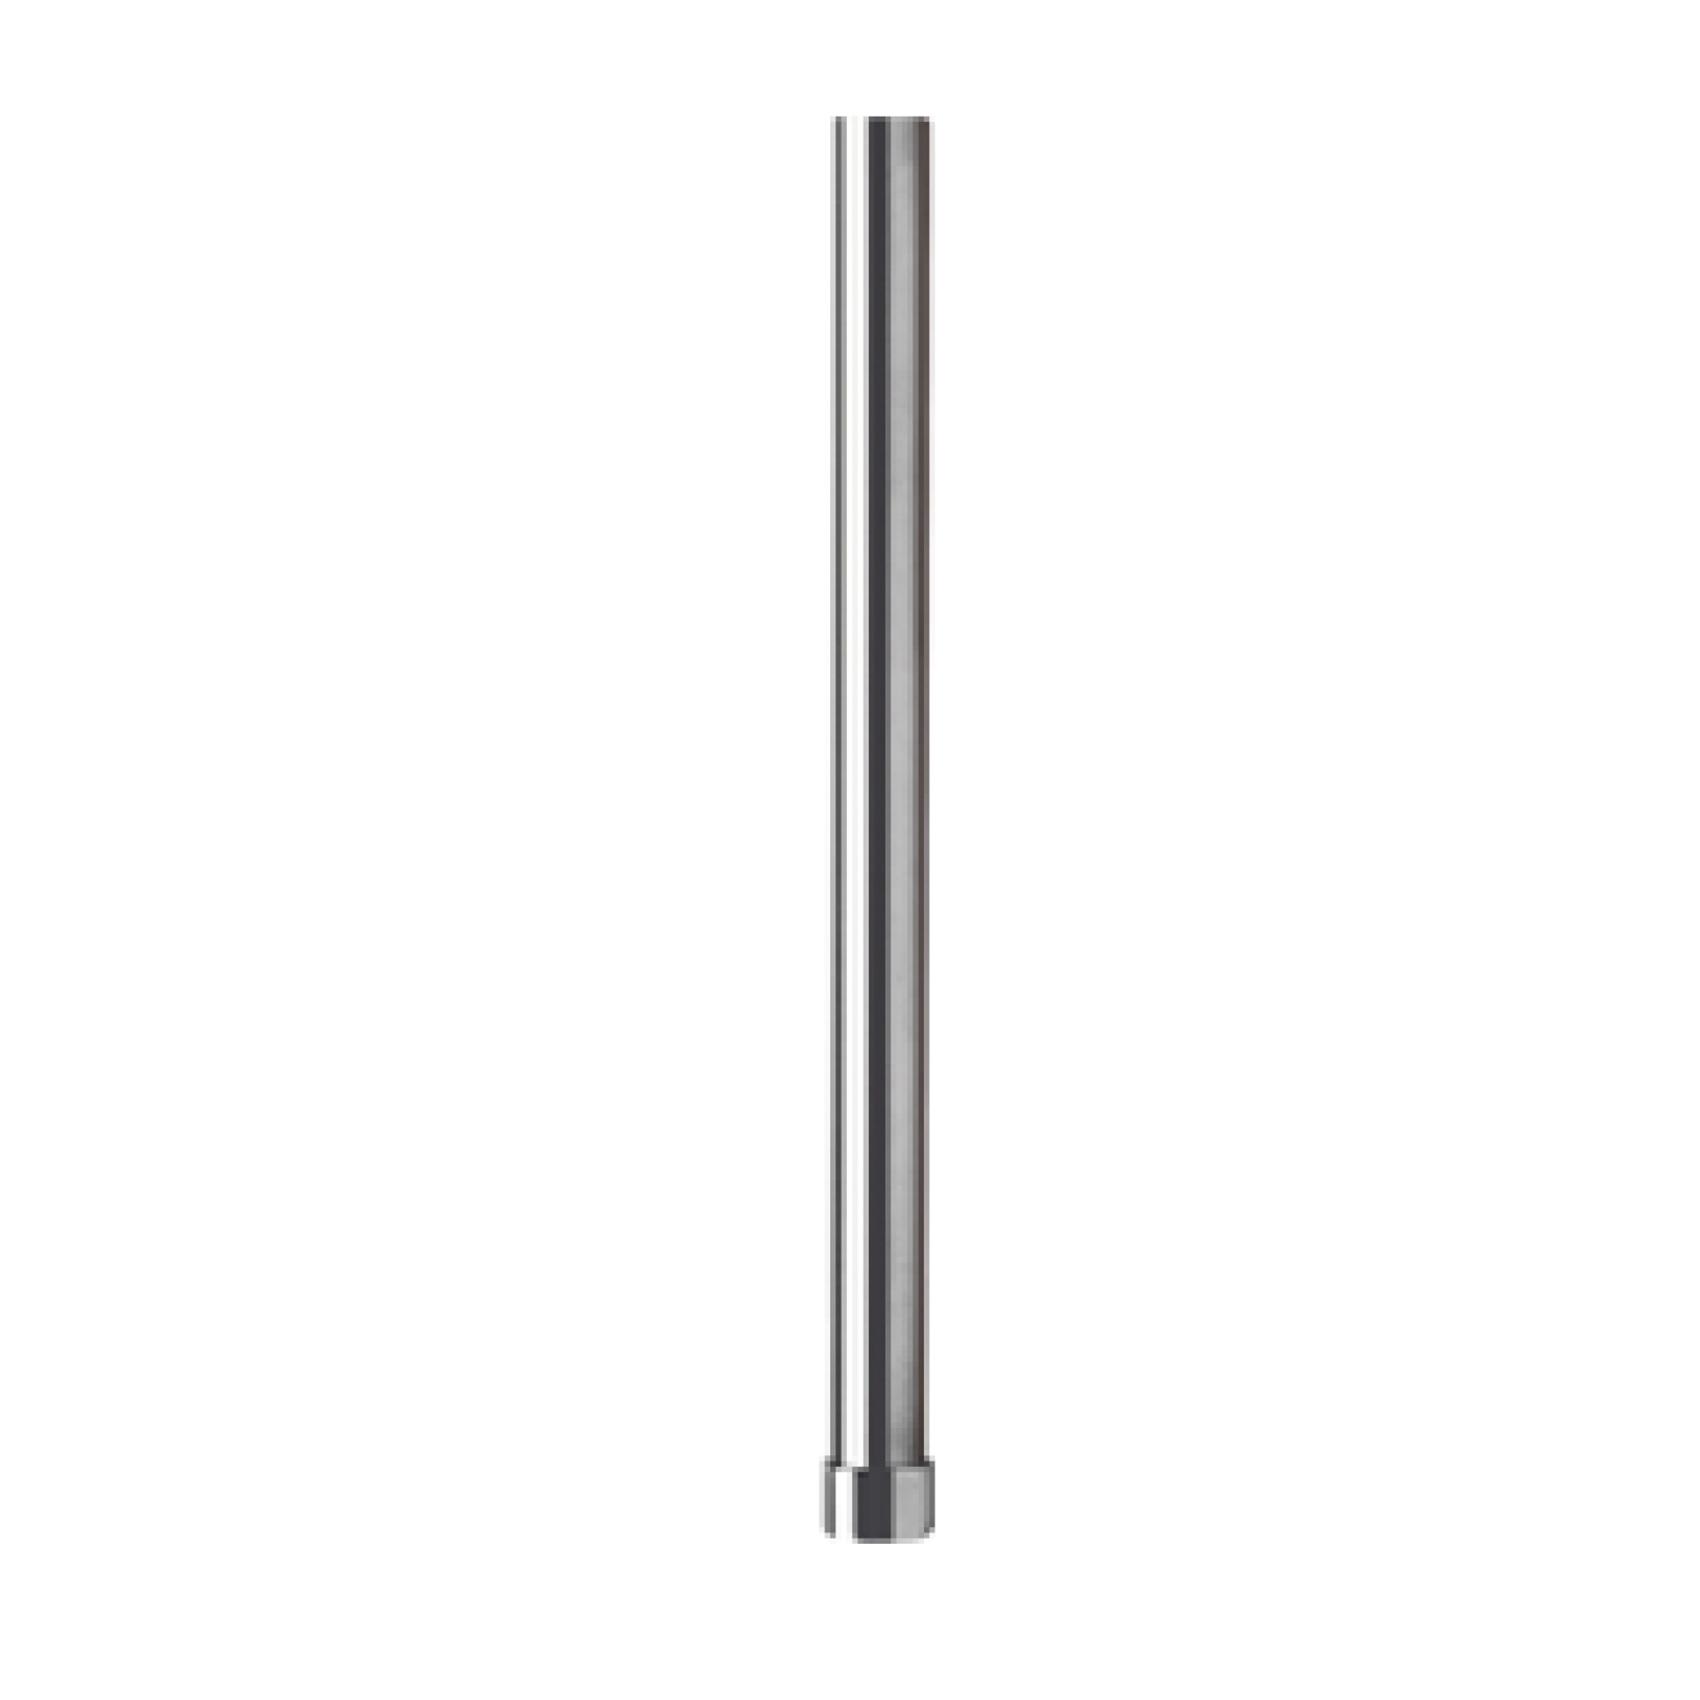 304L Stainless Steel SCH 10 Single Random Length Pipe, Import